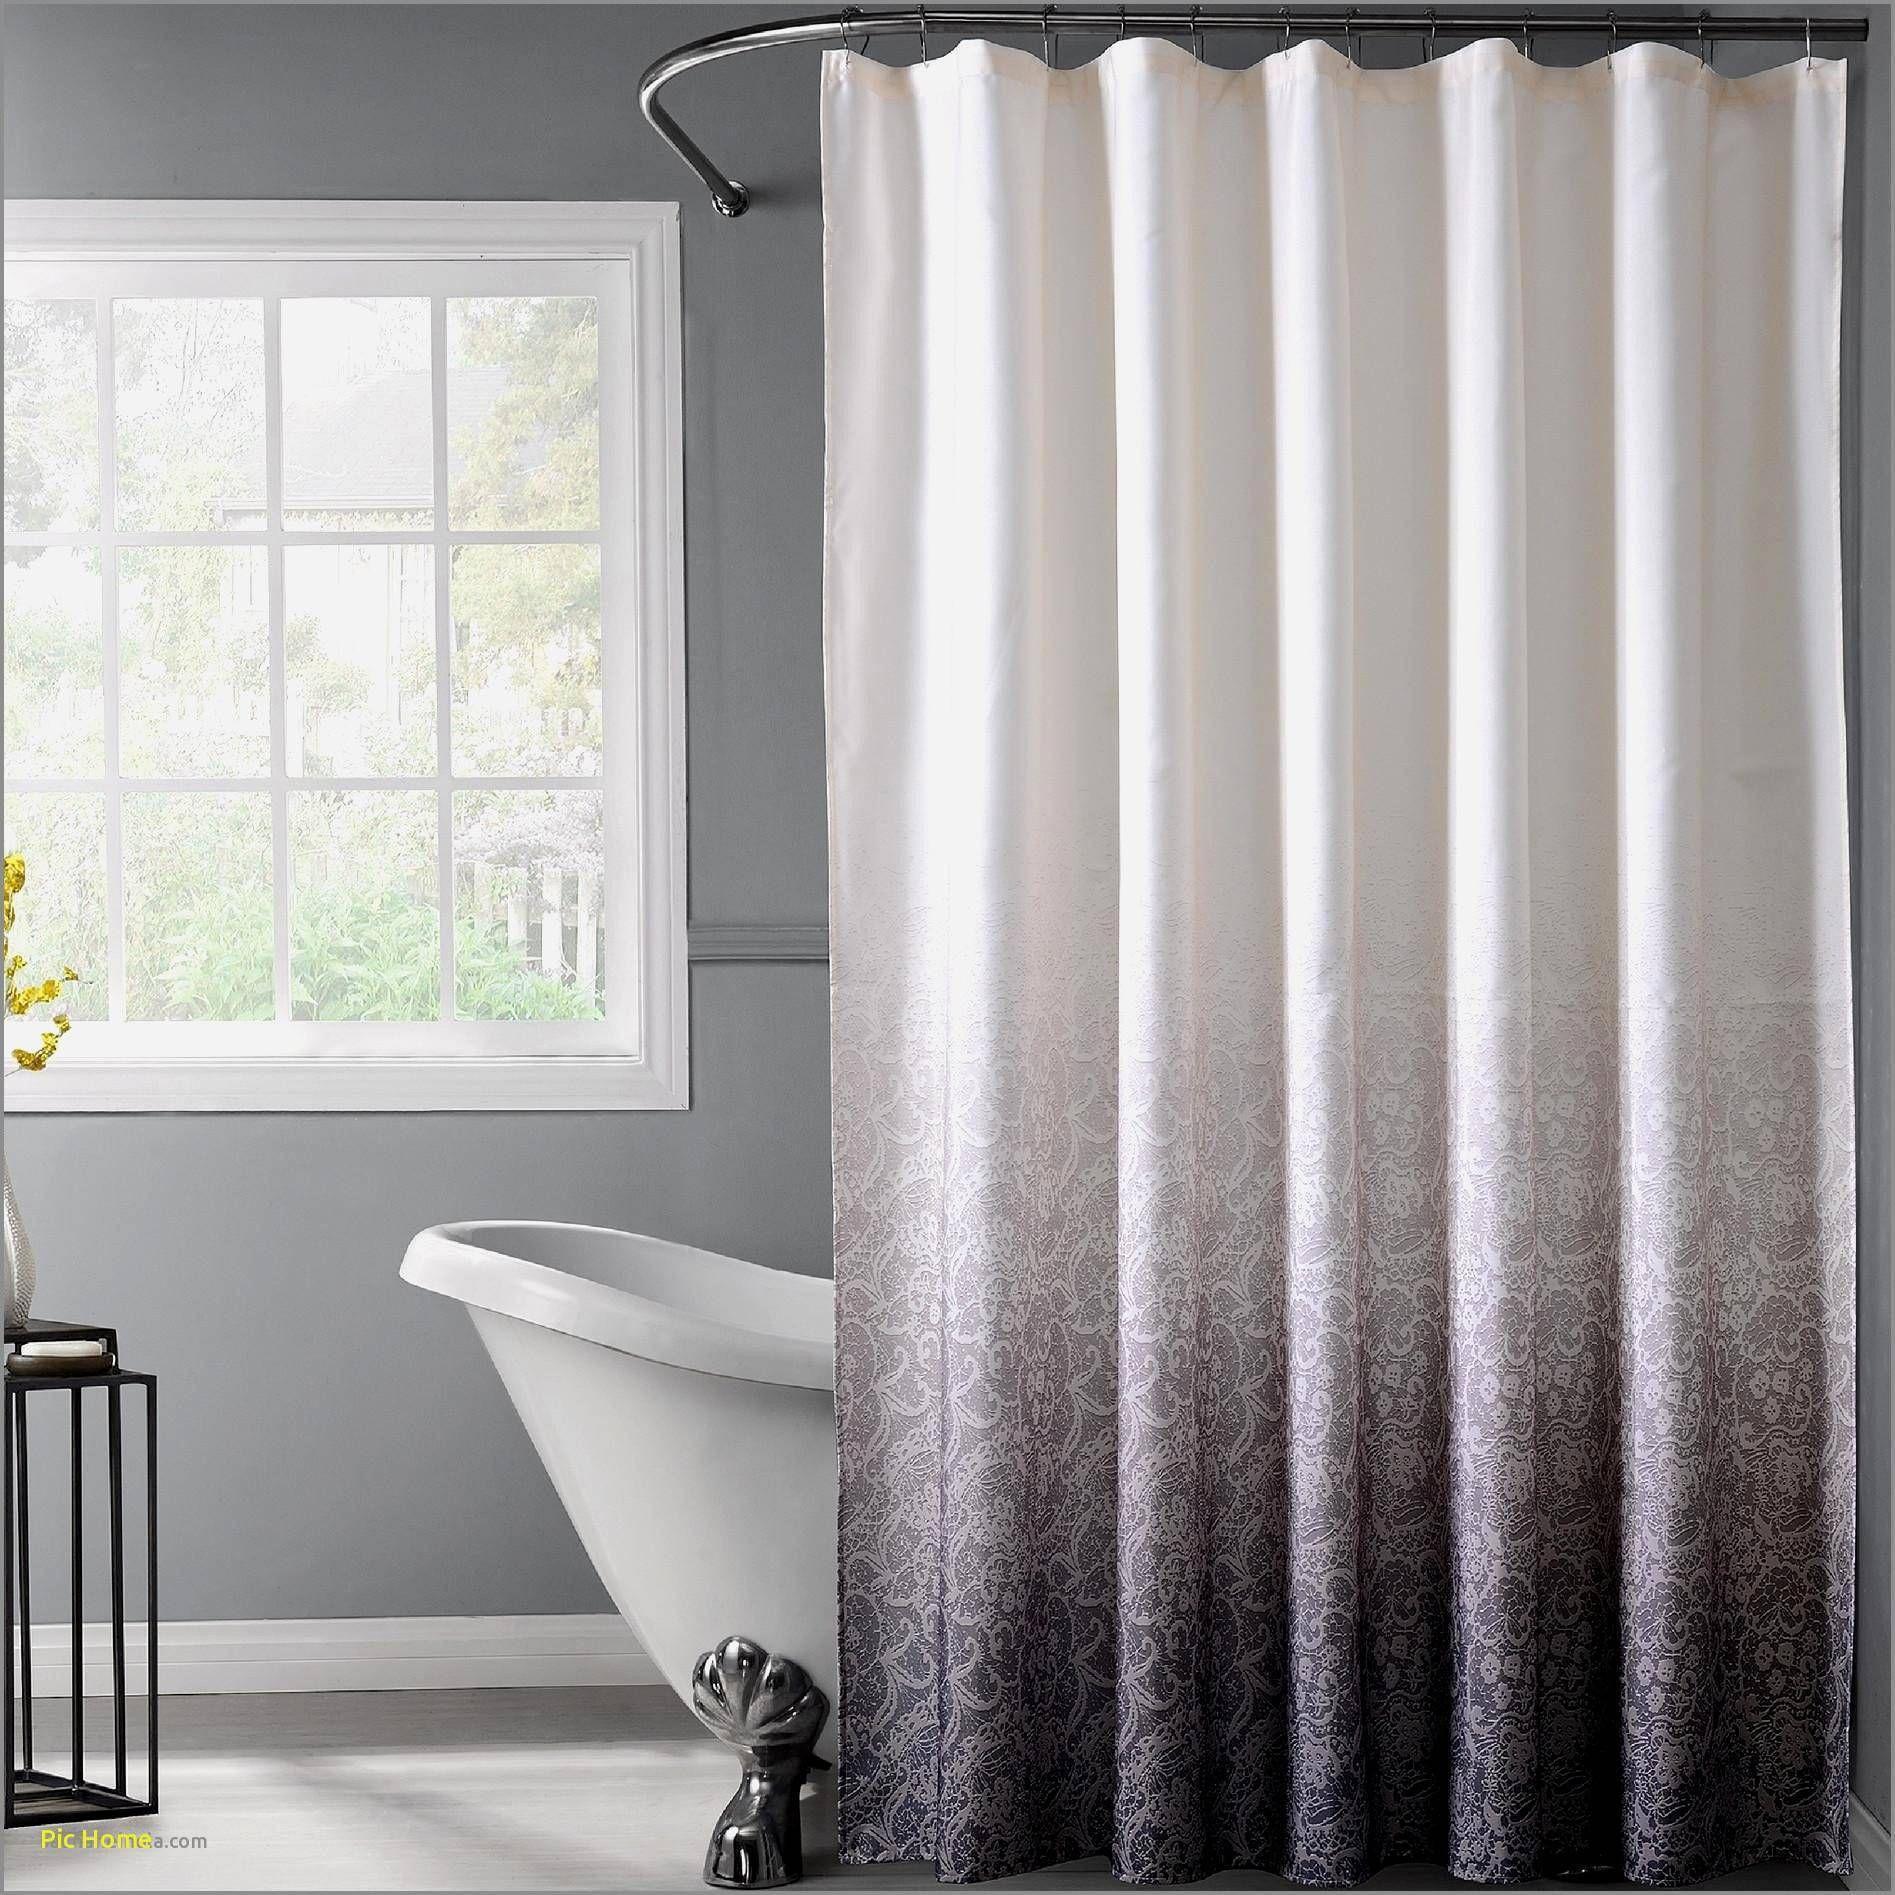 Elegant Home Decor Greenwood In Horden Tirai Shower